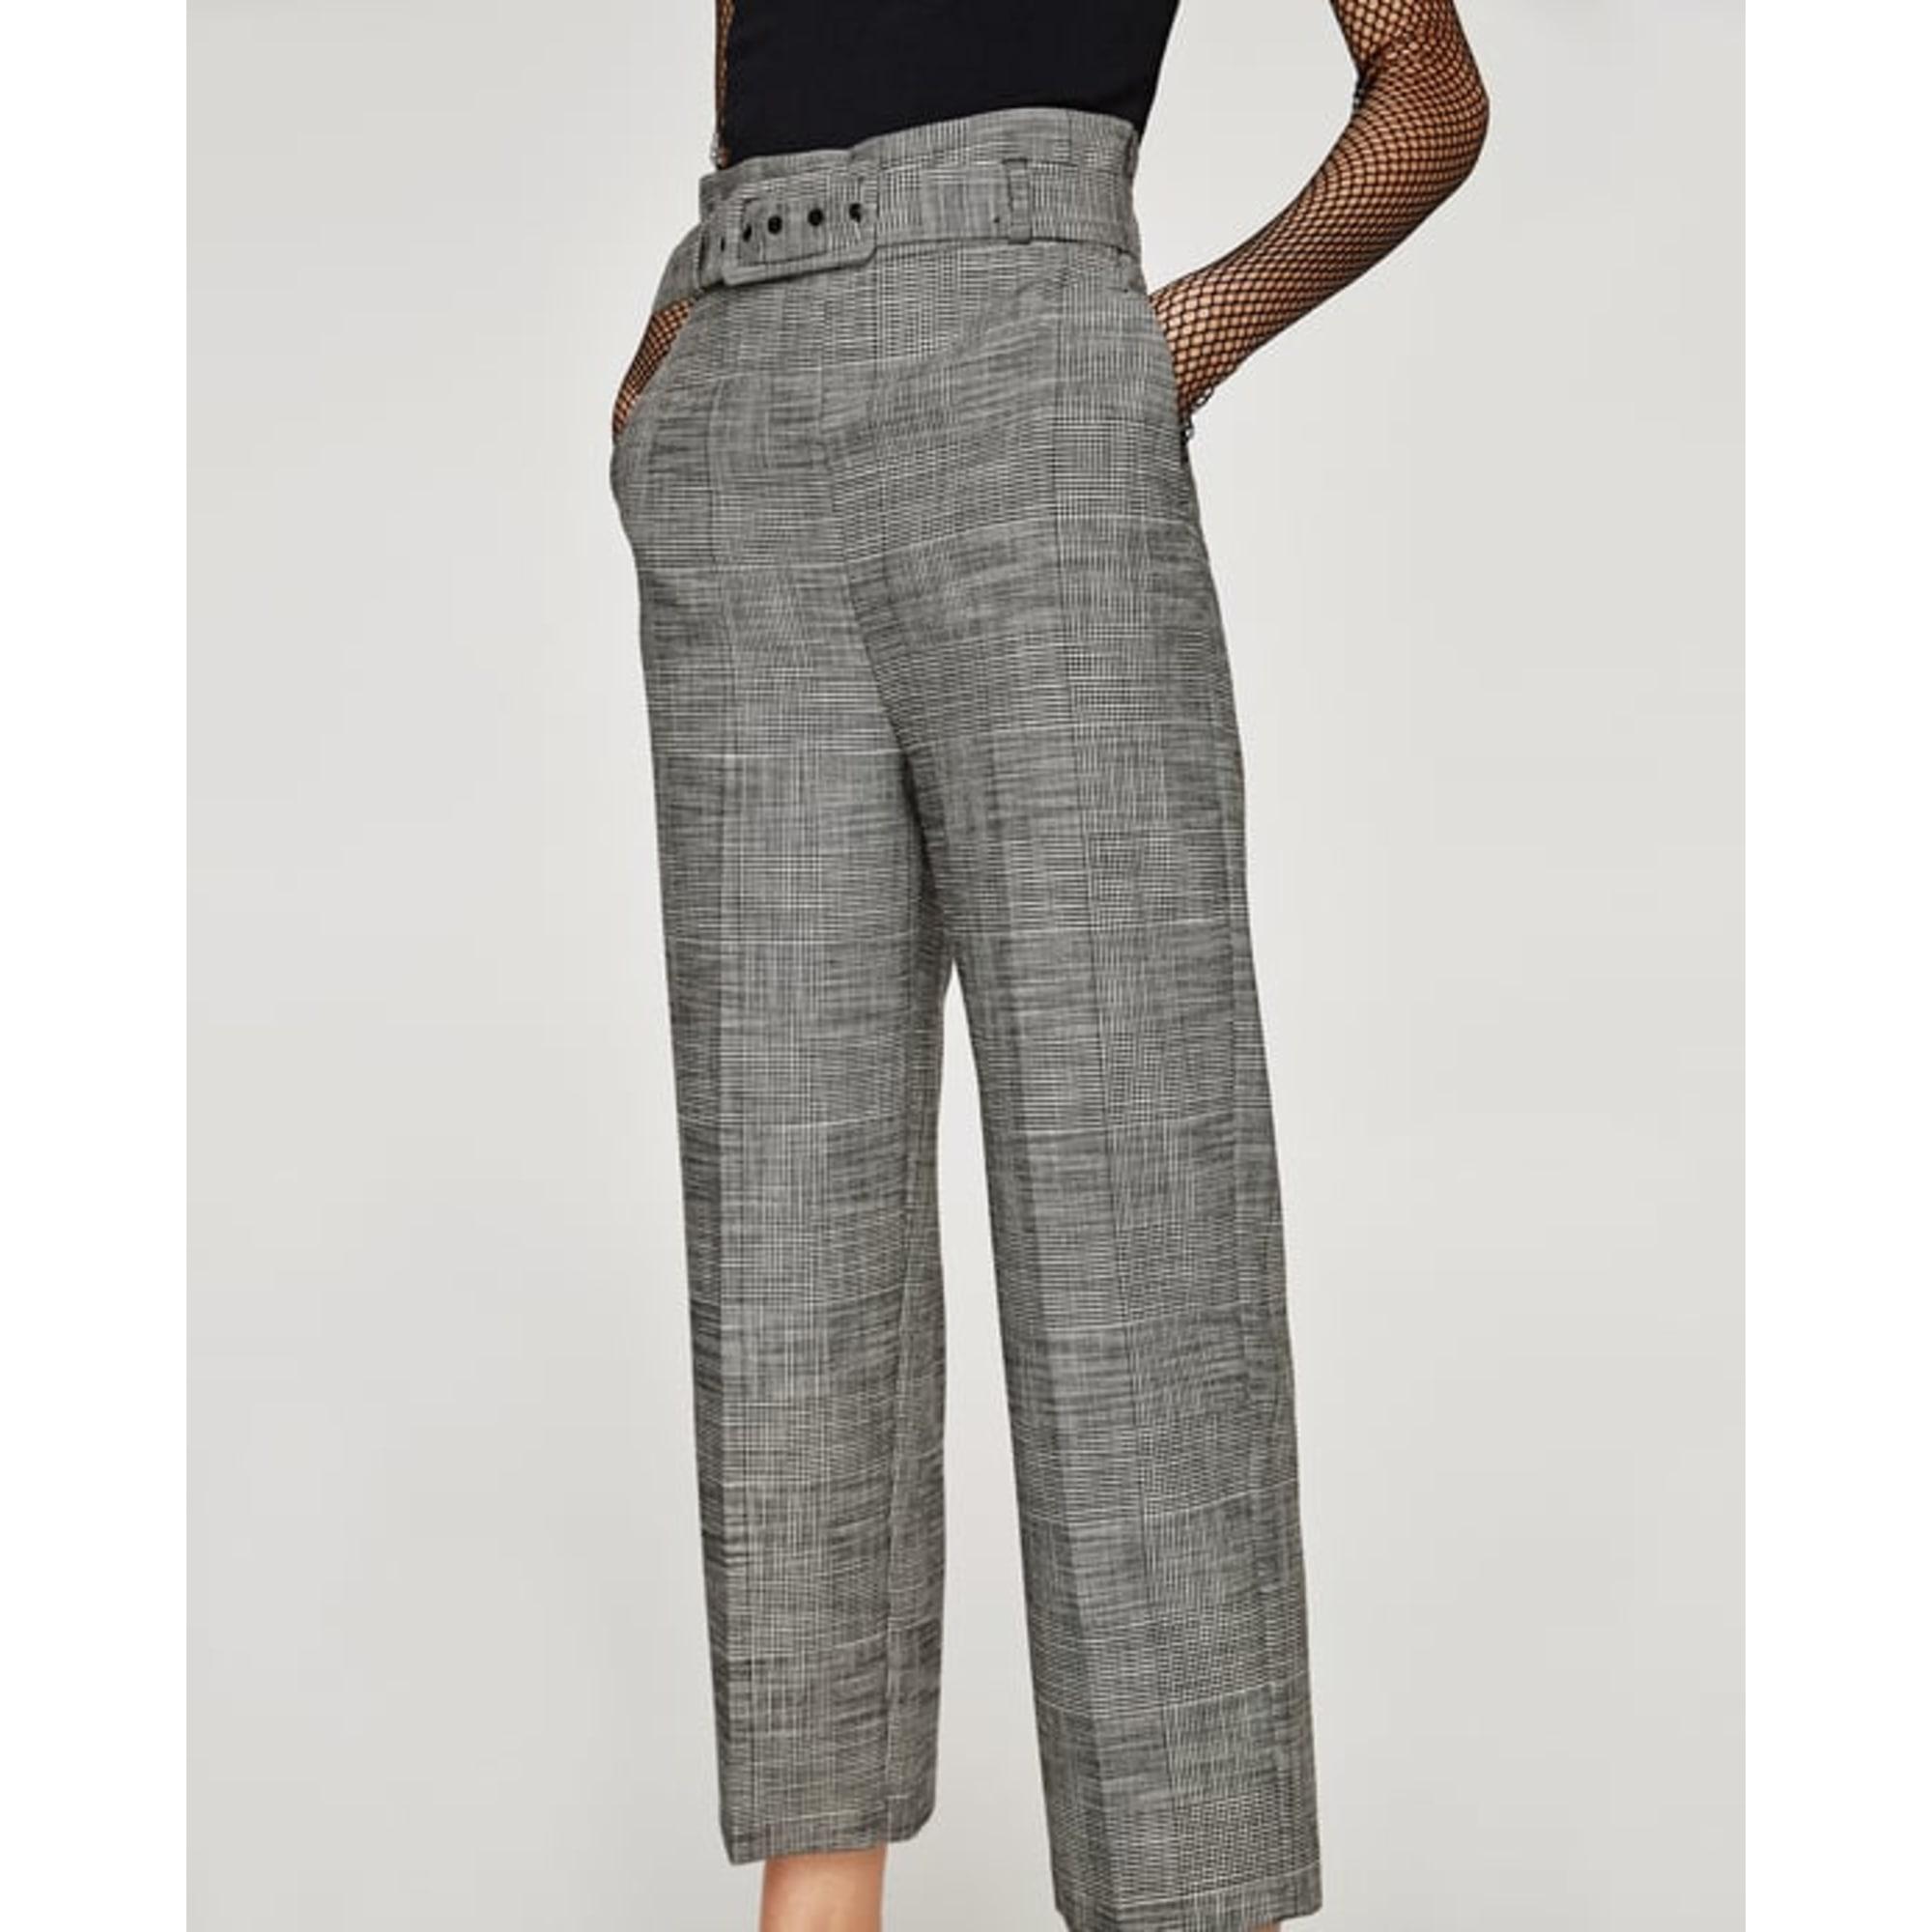 pantalon large gris femme zara